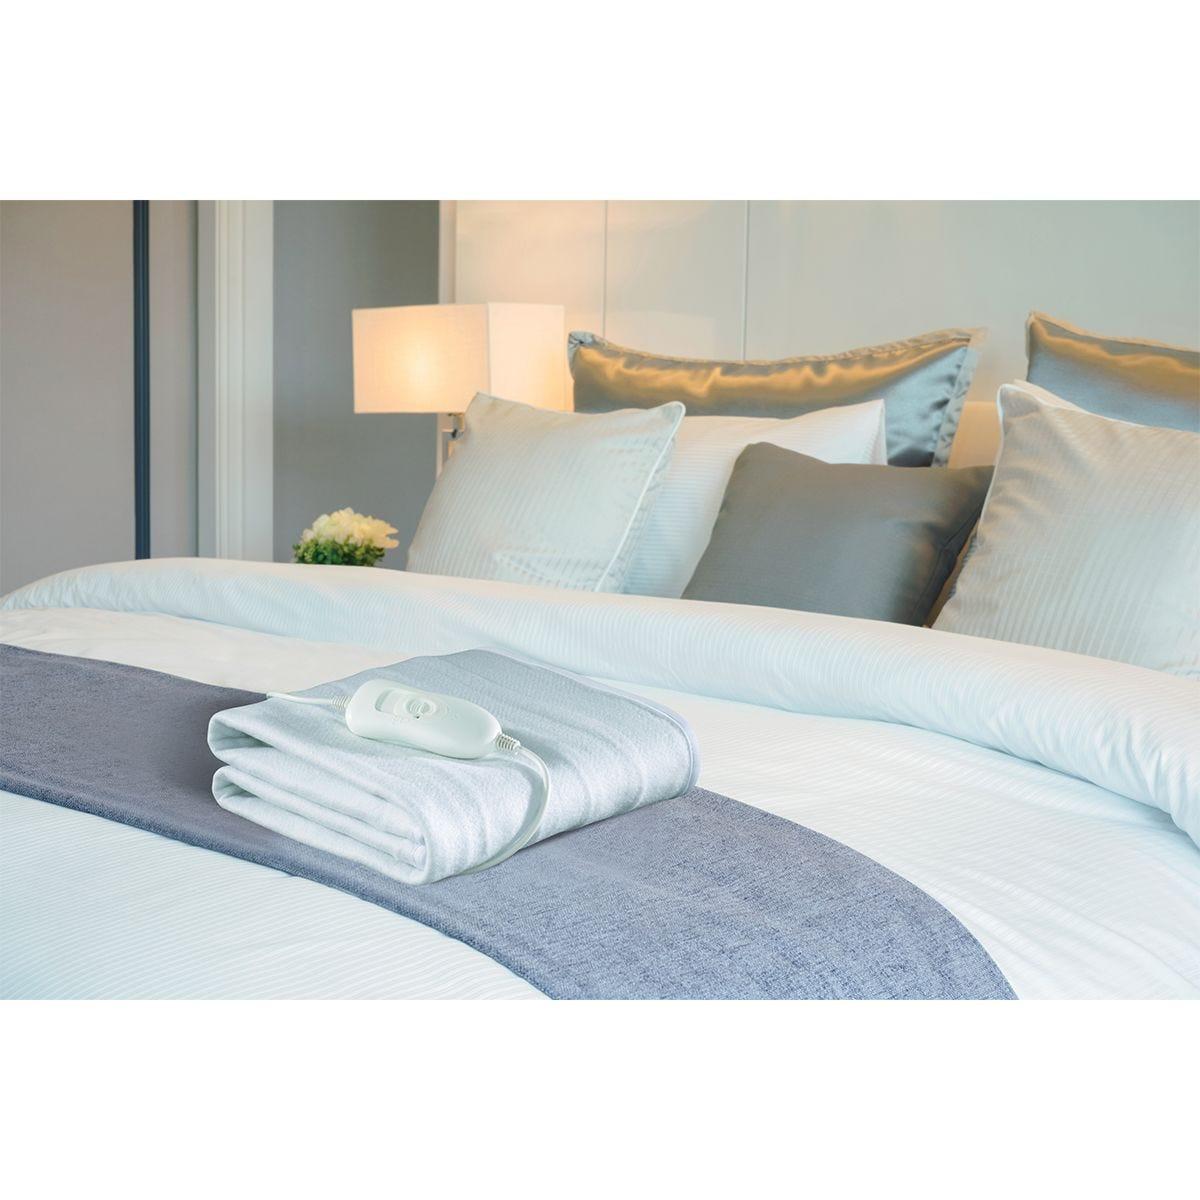 Fine Elements Single Size Electric Heating Blanket